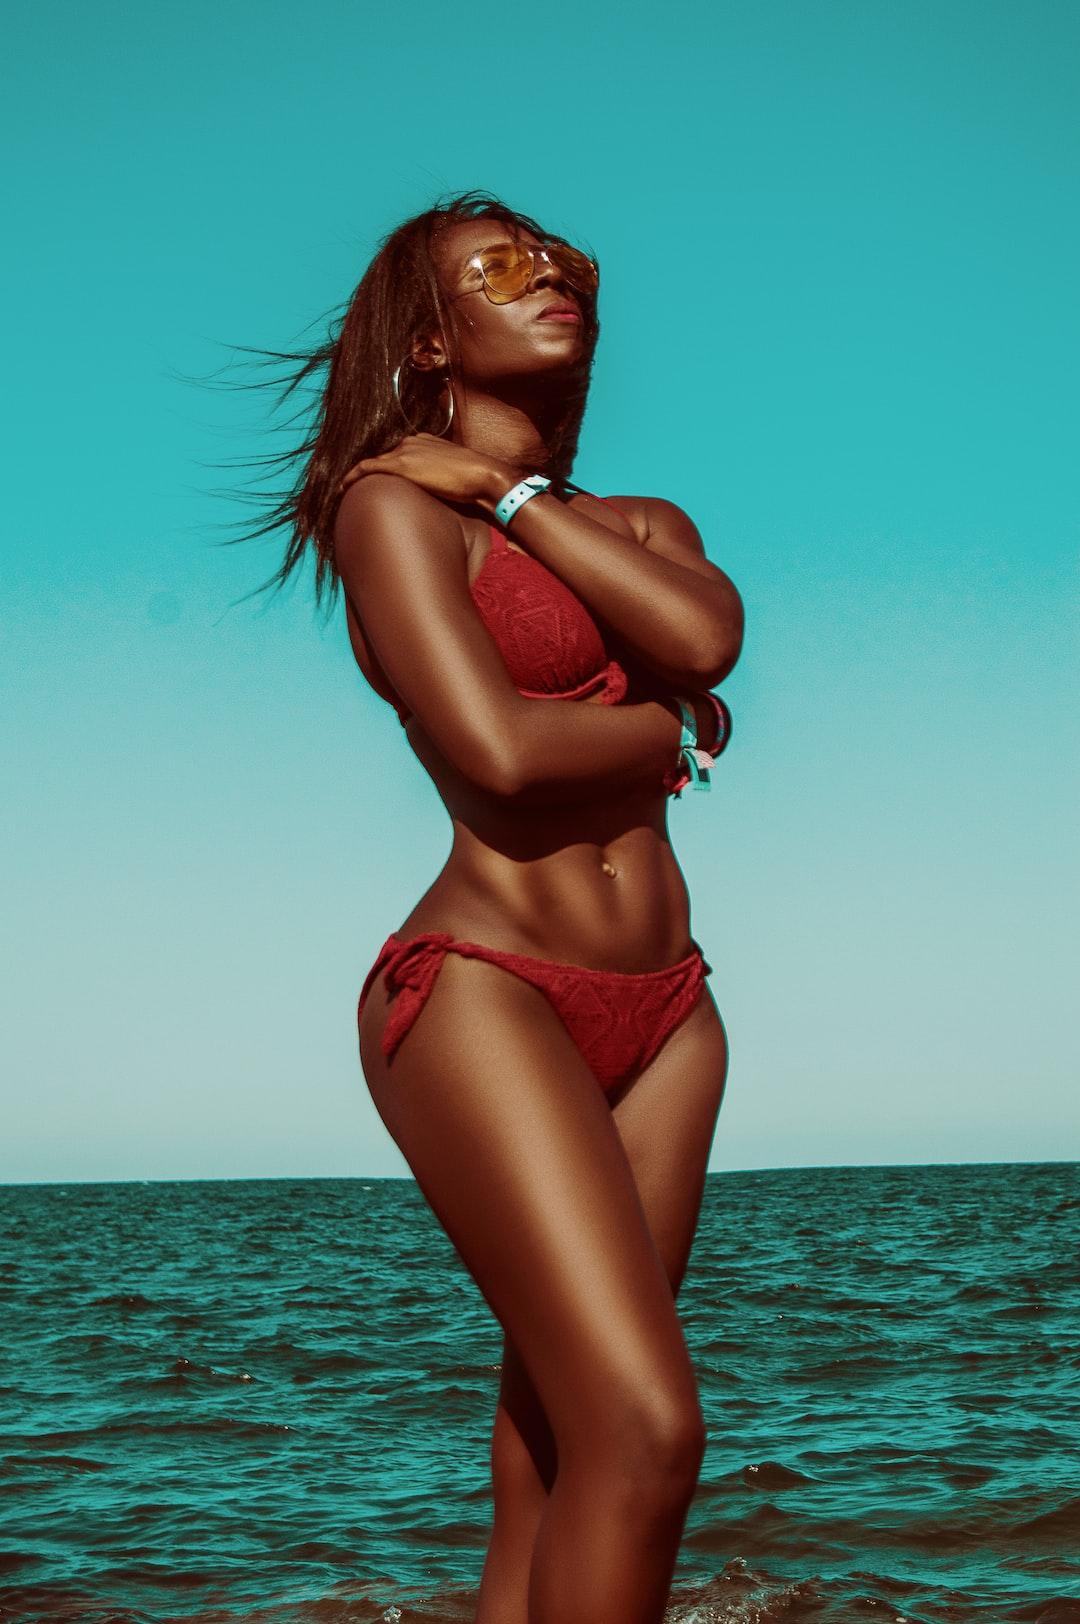 Beautiful summer fashion portrait of a gorgeous black model wearing a red bikini .